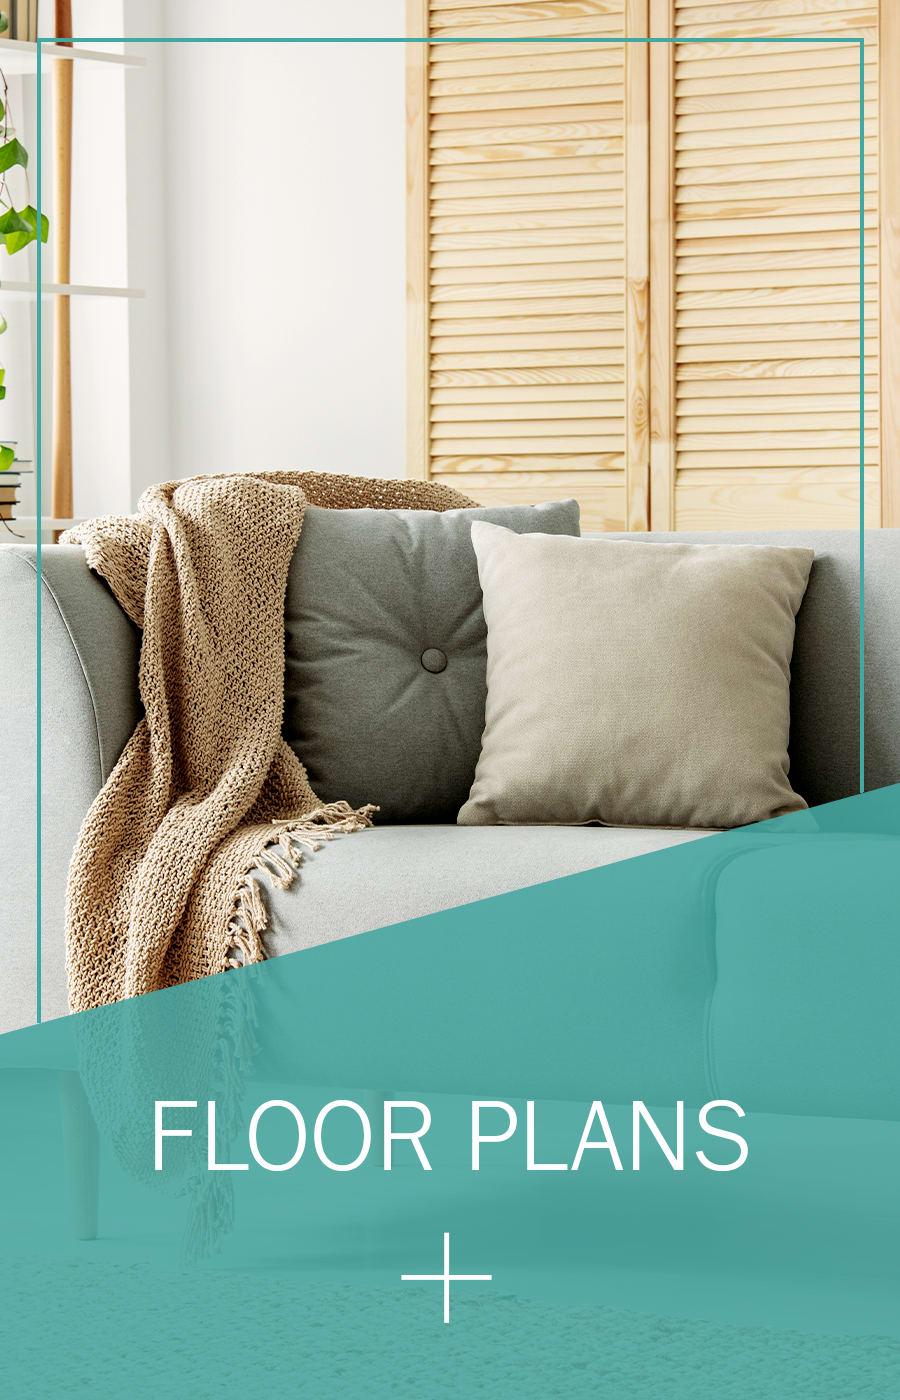 Floor plans graphic